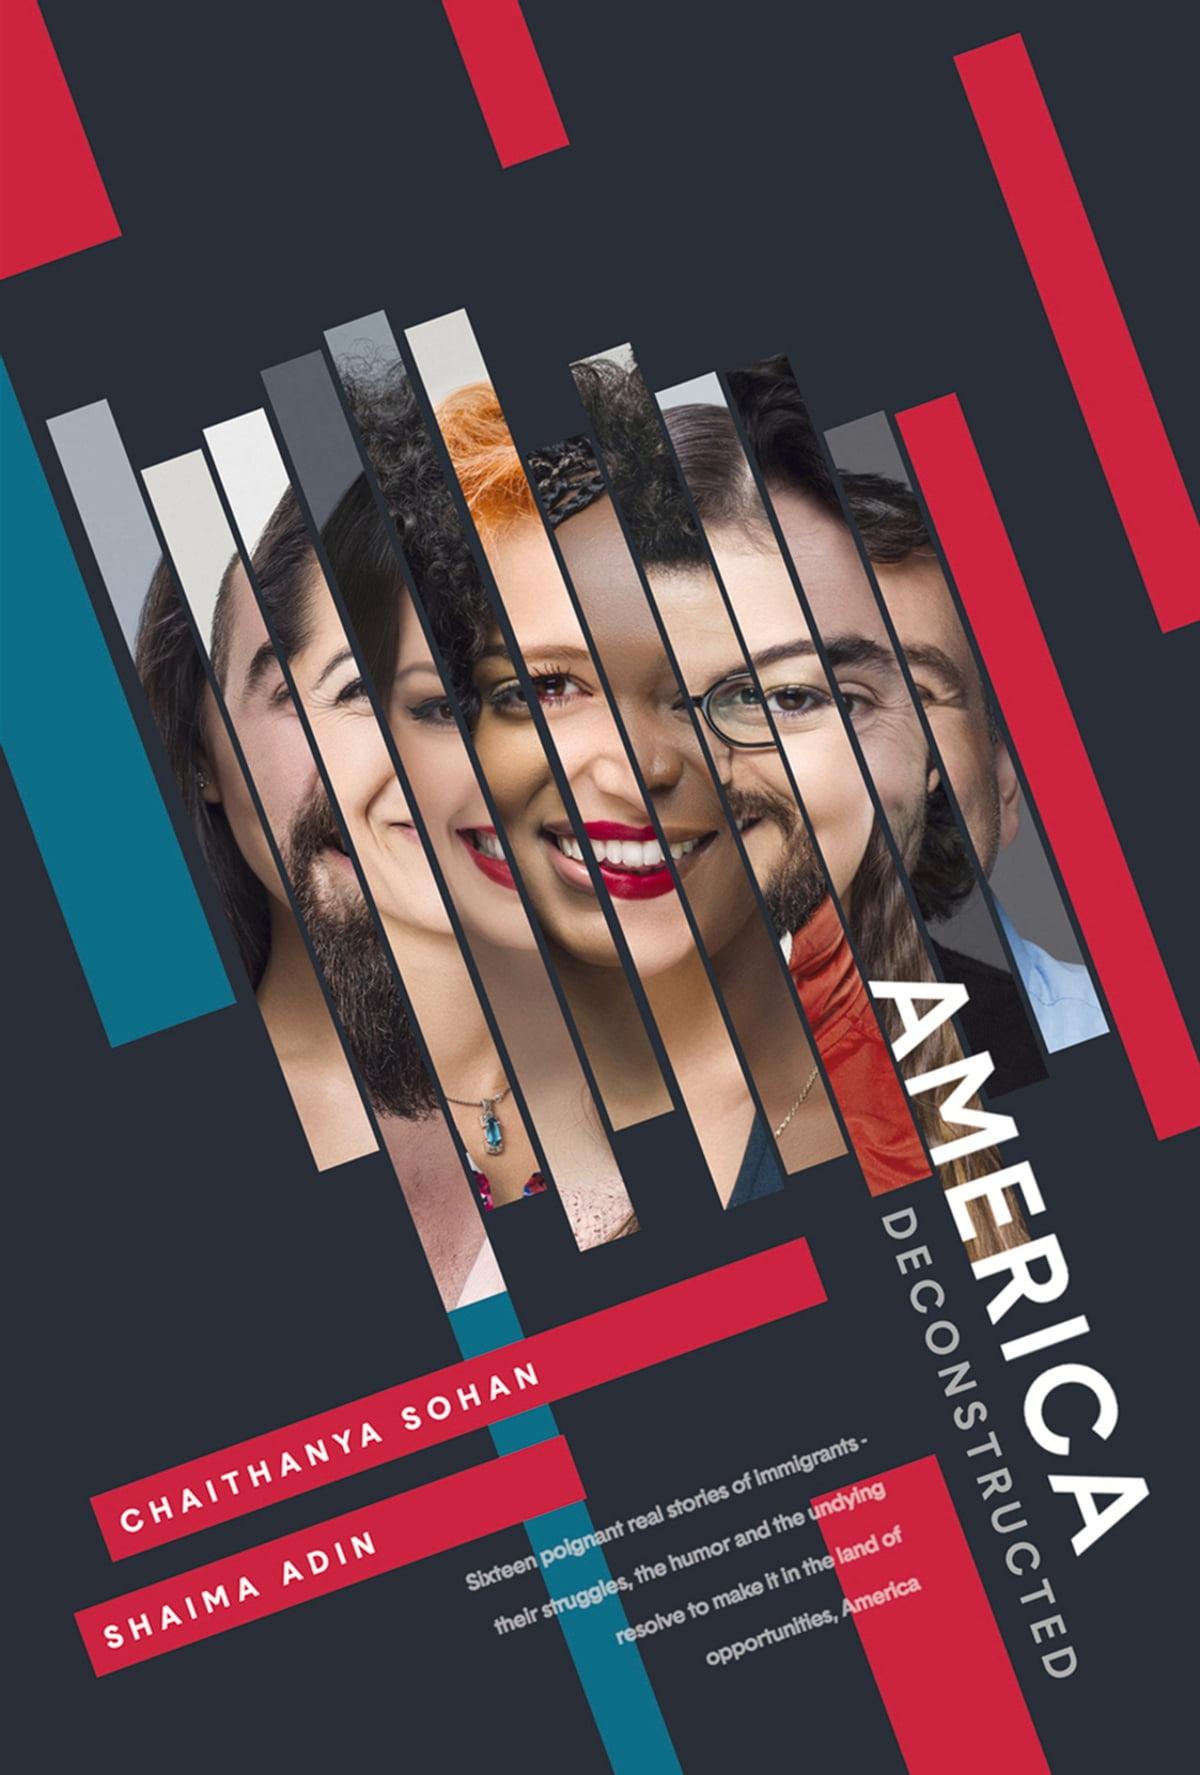 America Deconstructed Ebook By Chaithanya Sohan 9781628656206